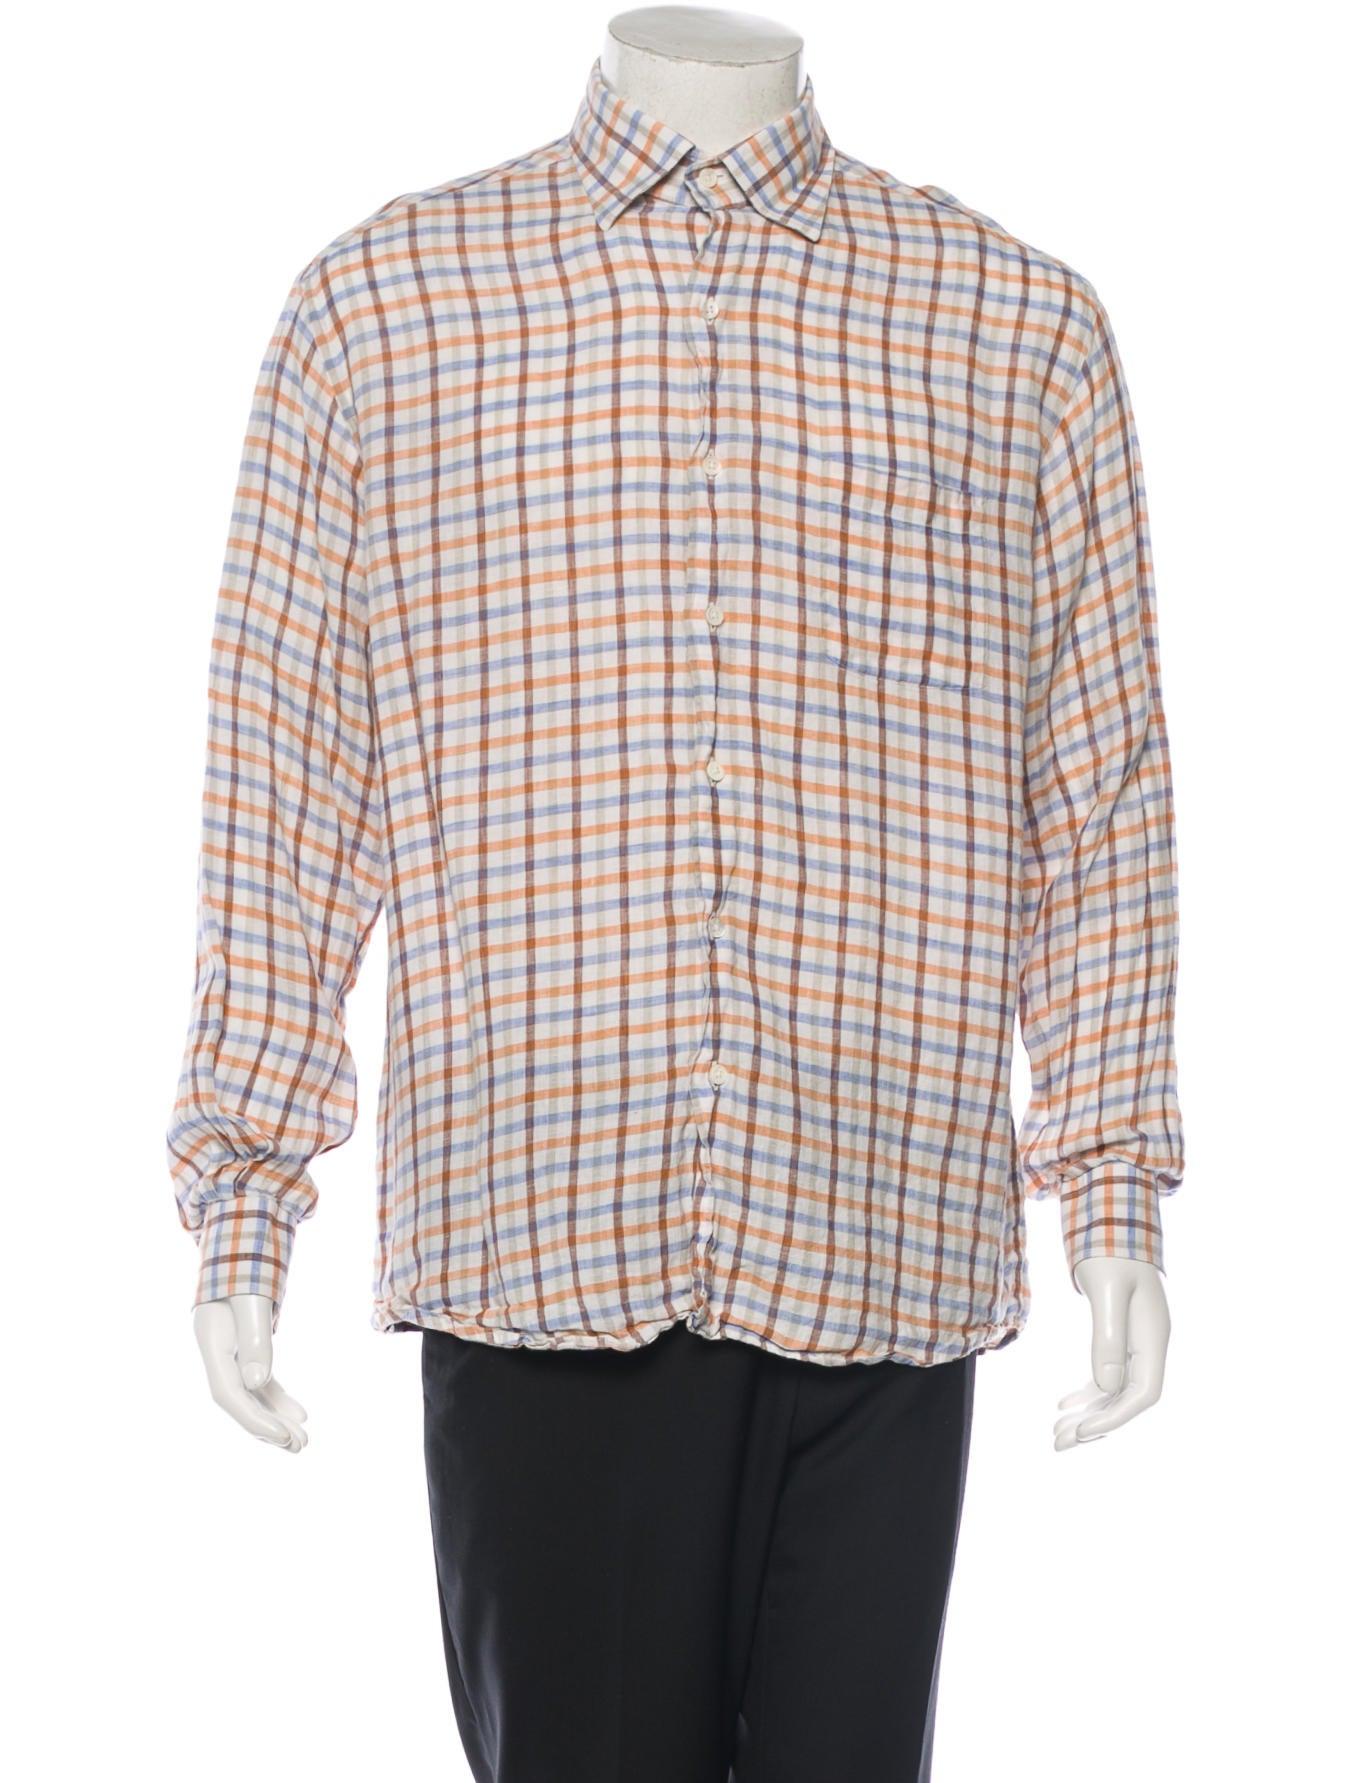 ermenegildo zegna linen button up shirt clothing zgn22686 the realreal. Black Bedroom Furniture Sets. Home Design Ideas